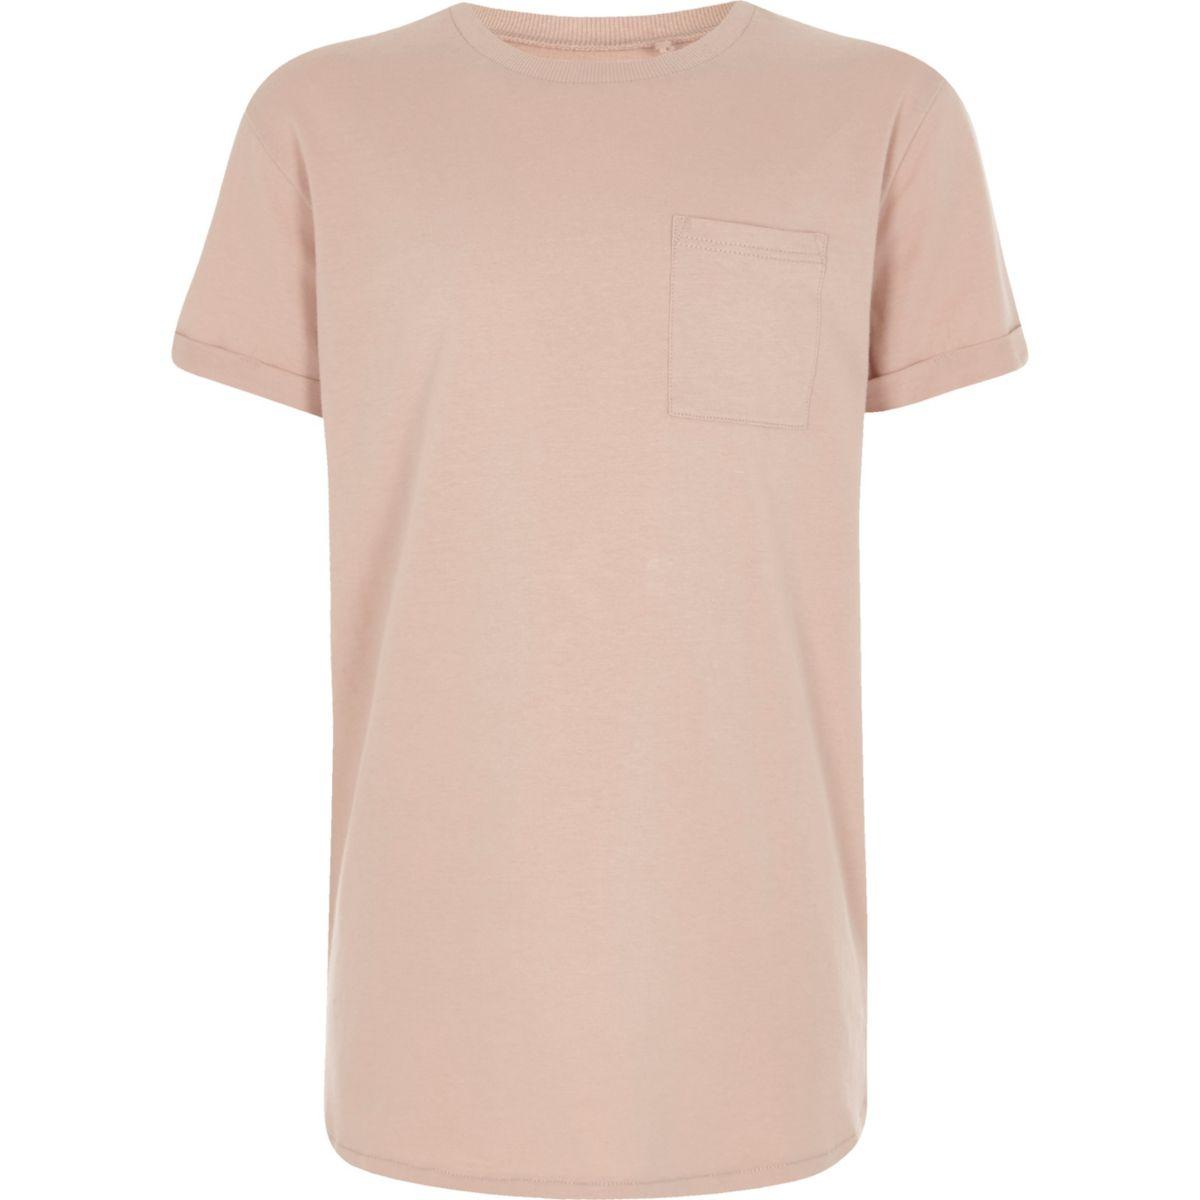 Boys light pink curved hem T-shirt